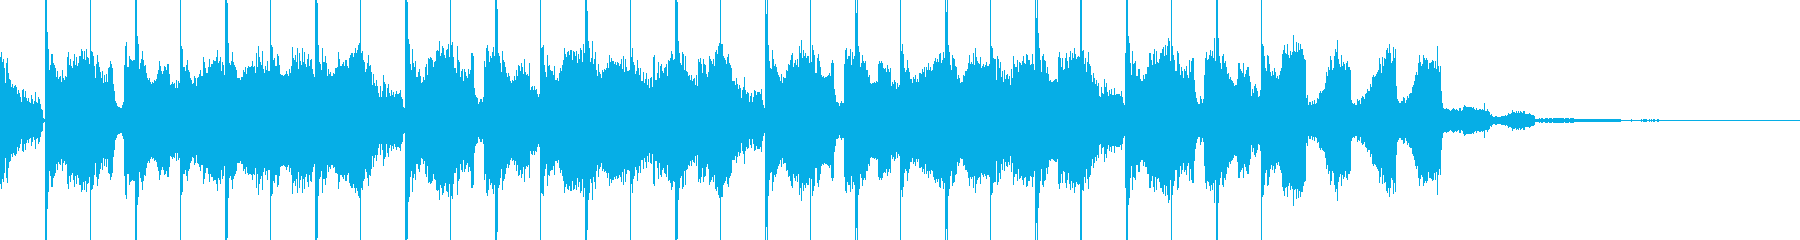 EDM・近未来的オープニングCMジングルの再生済みの波形